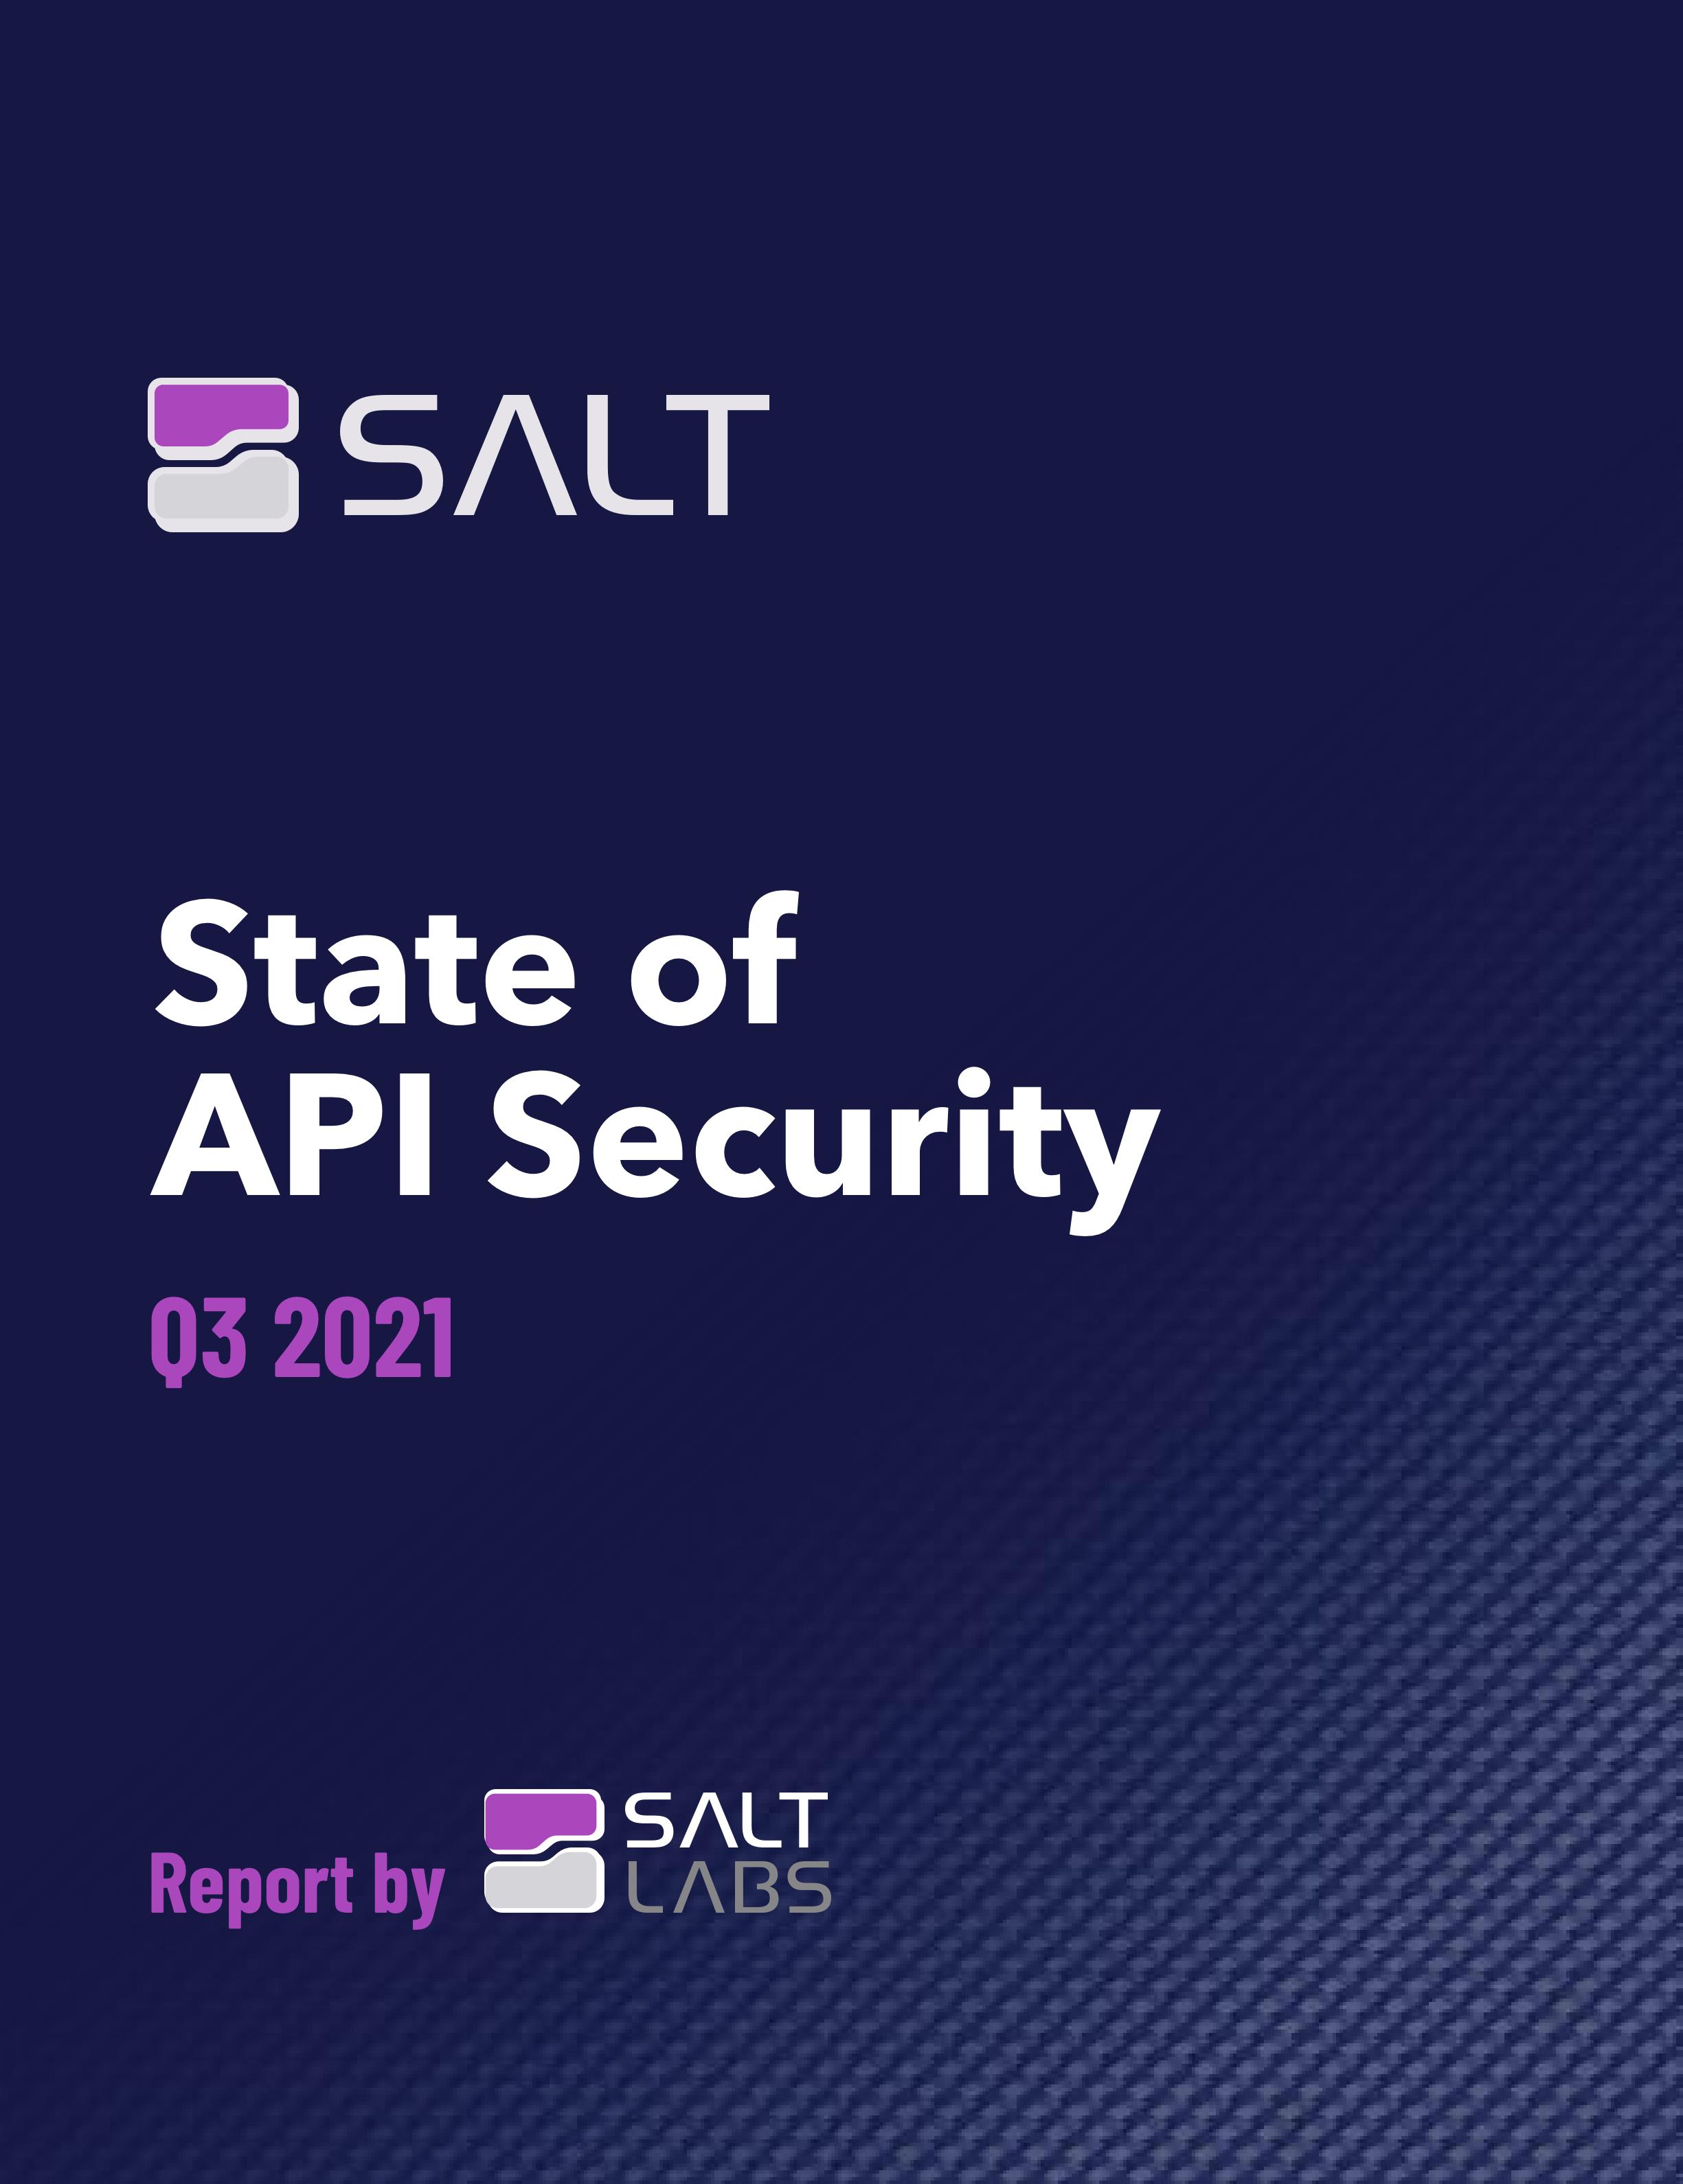 State of API Security - Q3 2021